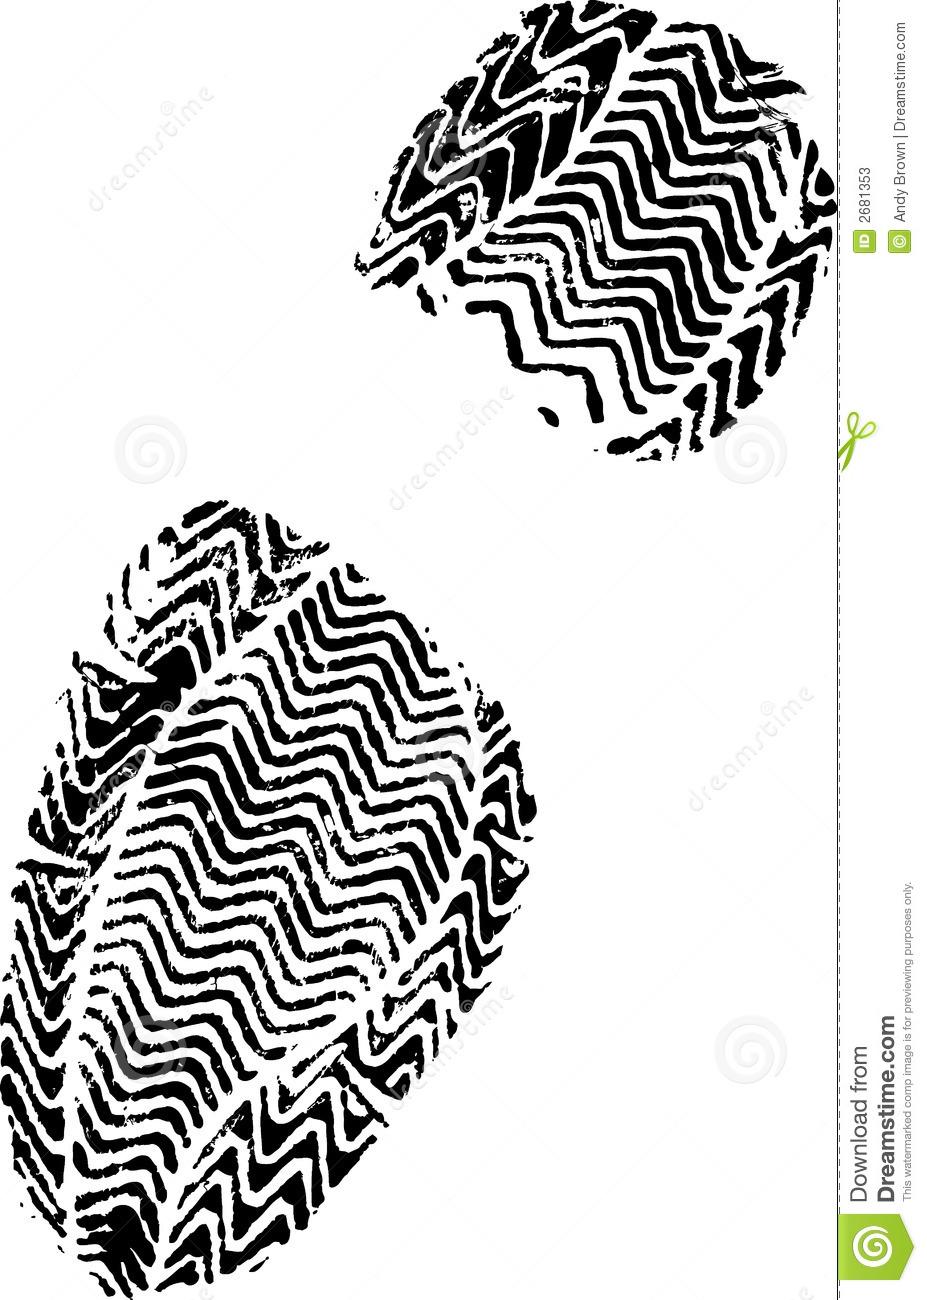 14 Tennis Shoe Print Vector Images.